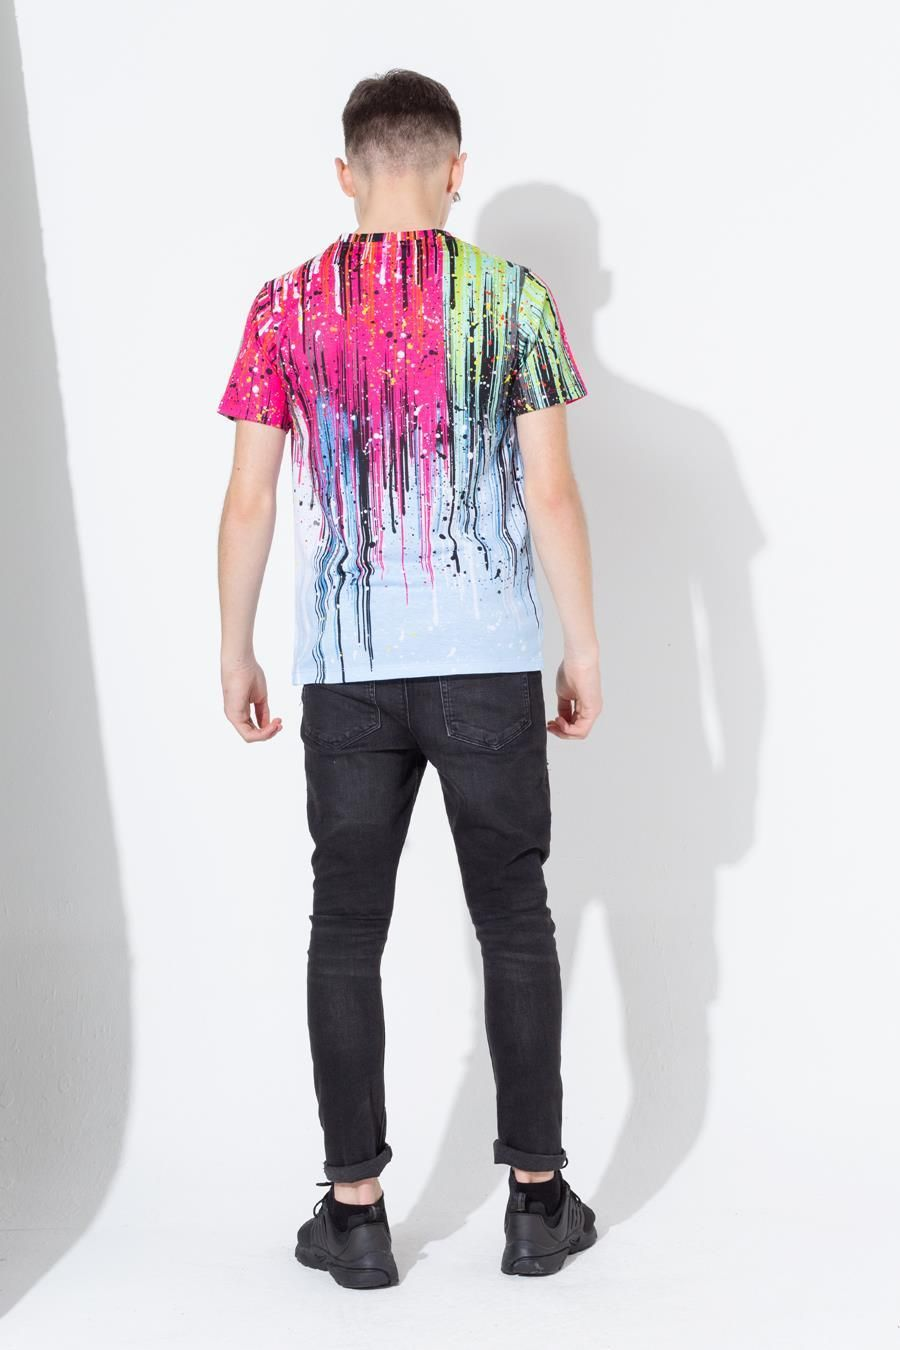 Hype Paint Rain Drips Kids T-Shirt